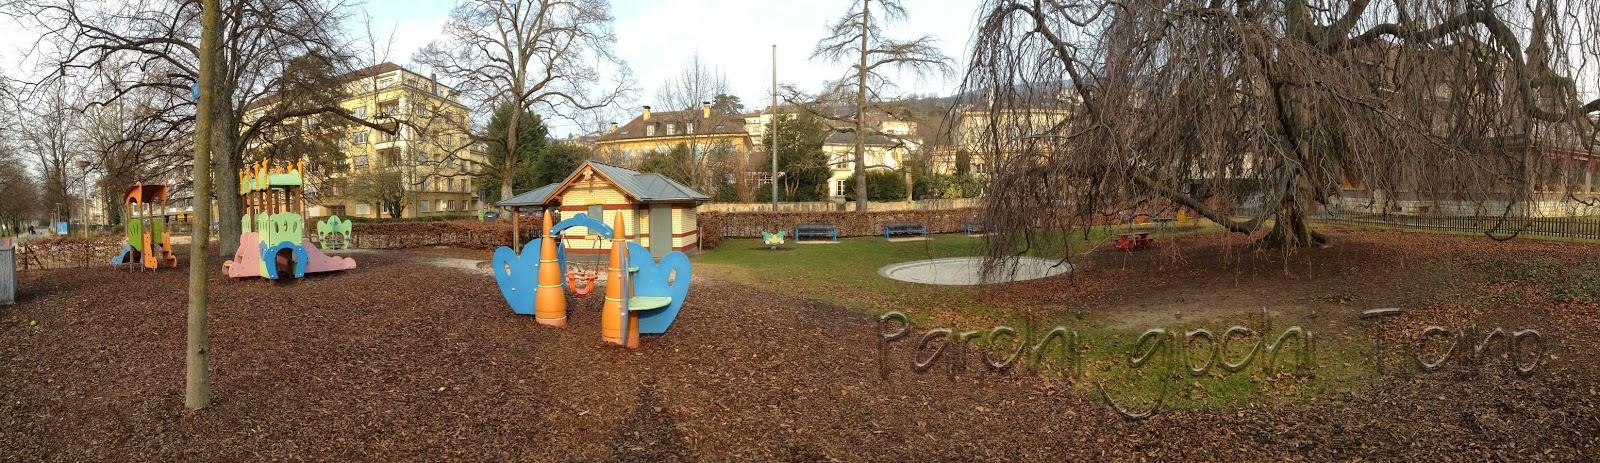 Parco giochi jardin anglais neuch tel for Jardin anglais neuchatel